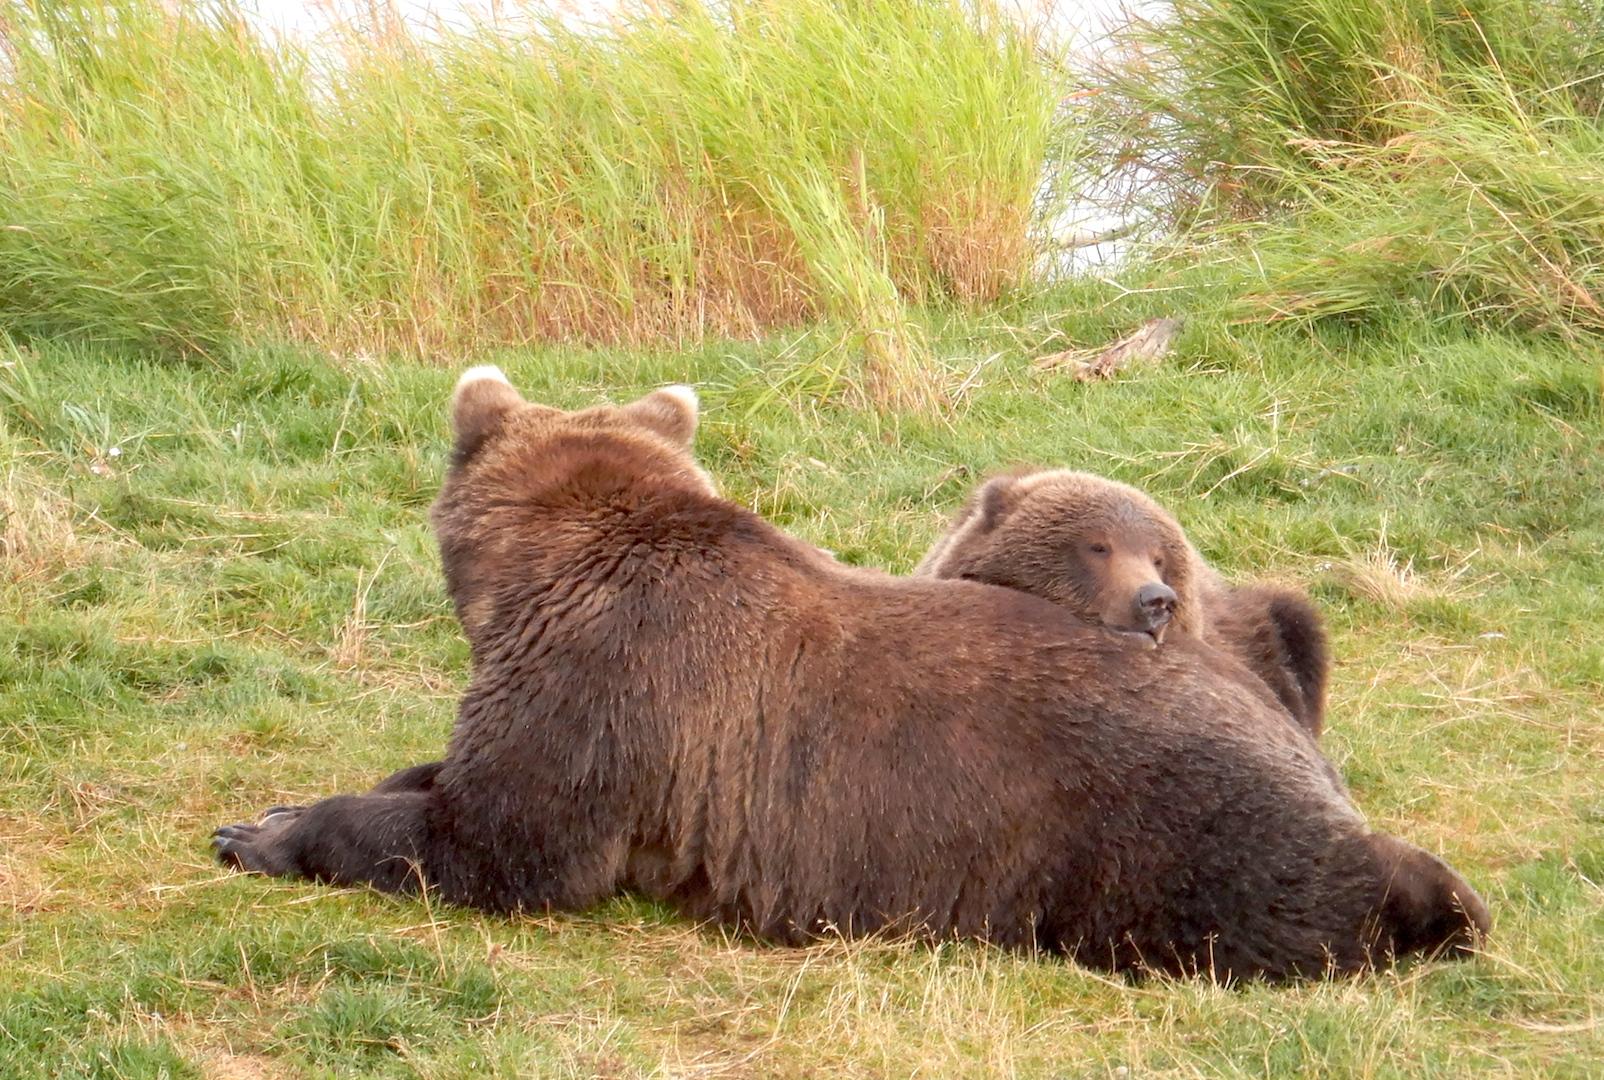 bear cub resting its head on its mother